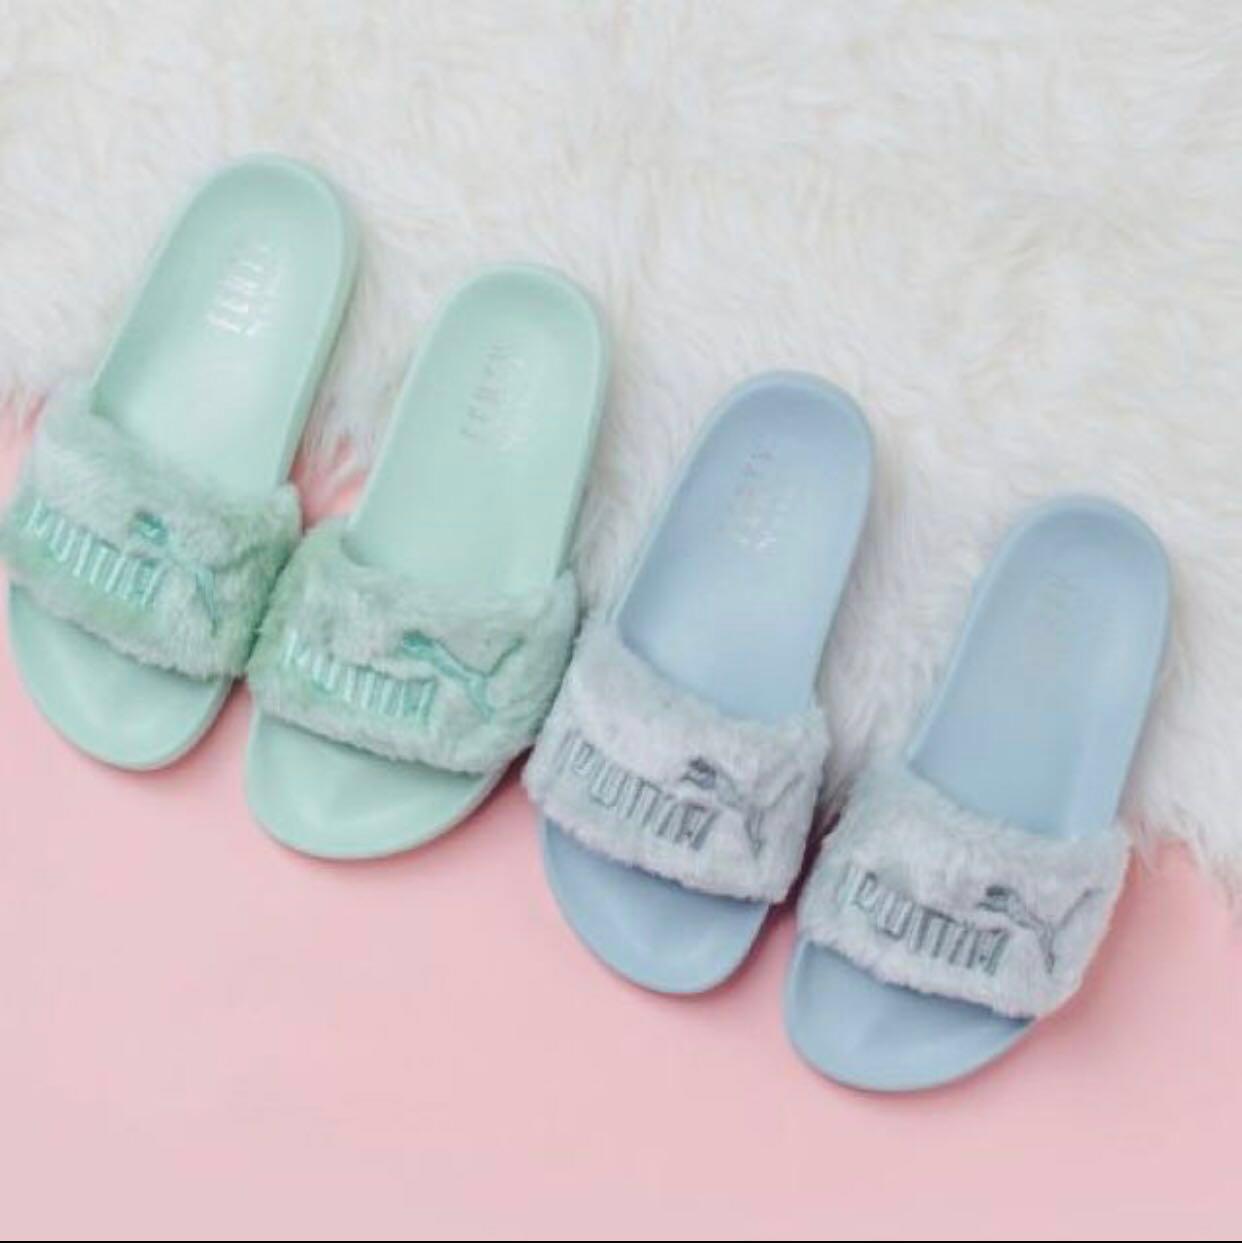 e17e37ecf7fe Rihanna x Puma Fenty Bay Fur Slides